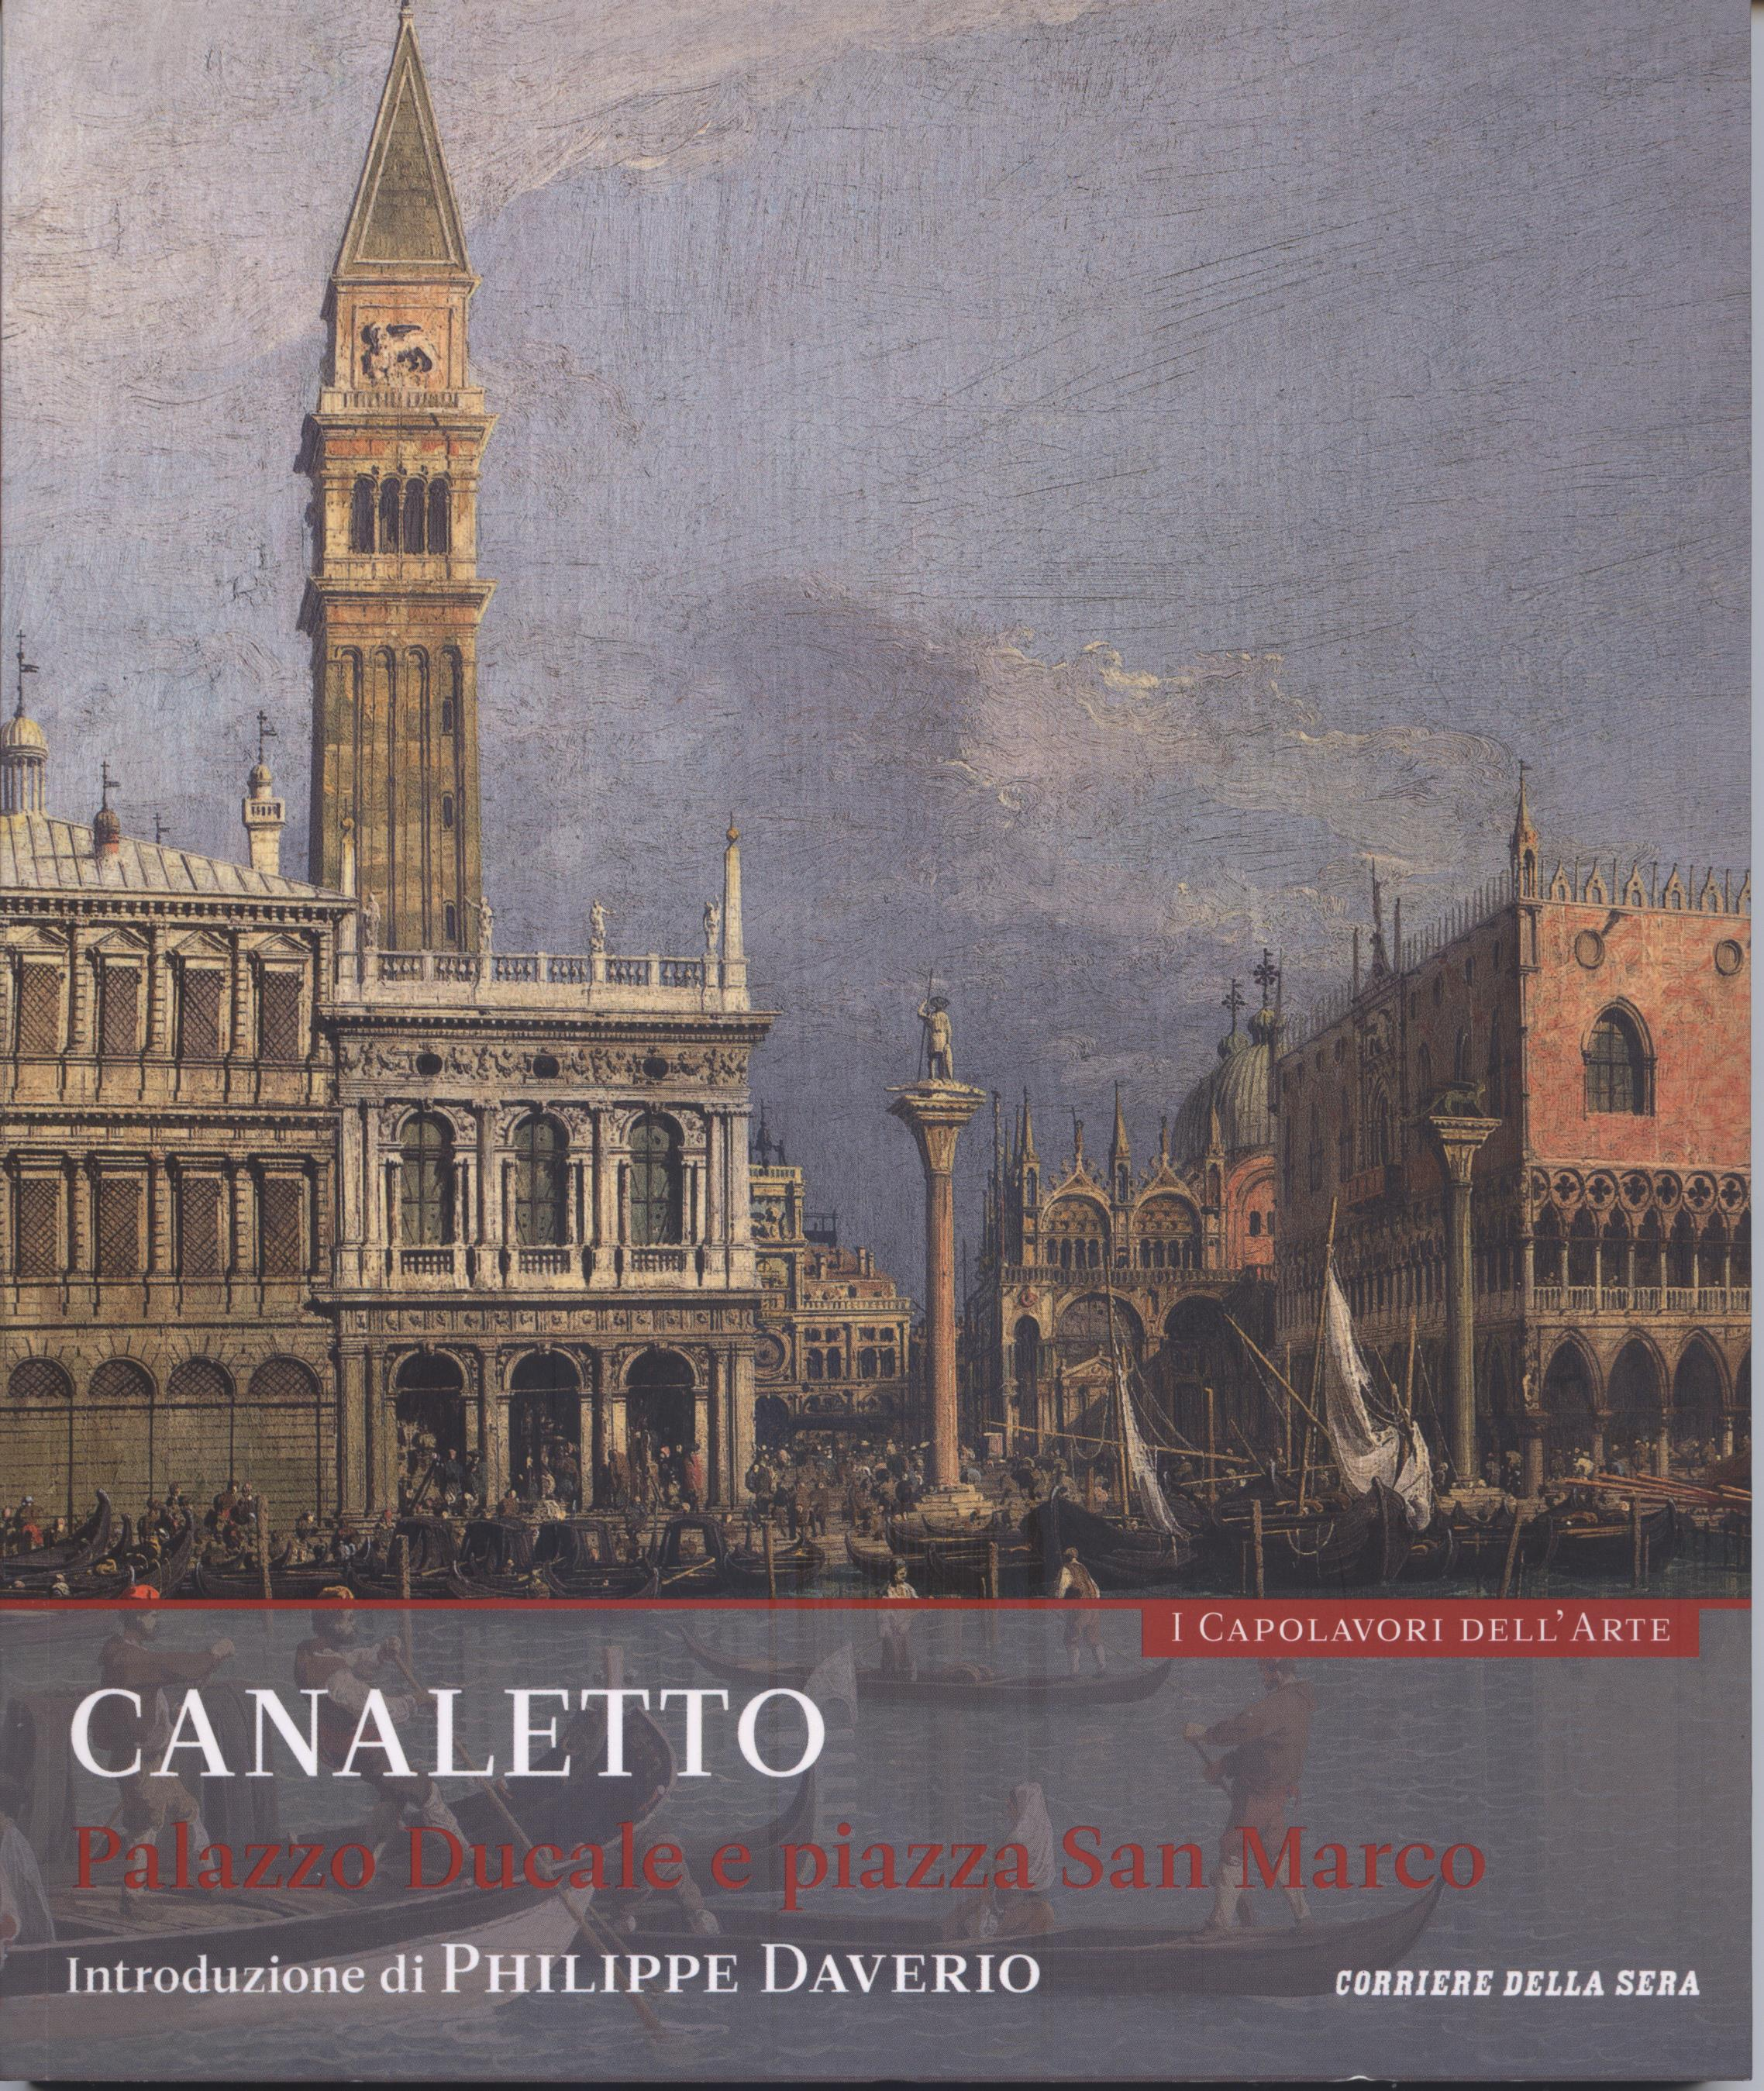 Canaletto - Palazzo Ducale e Piazza San Marco